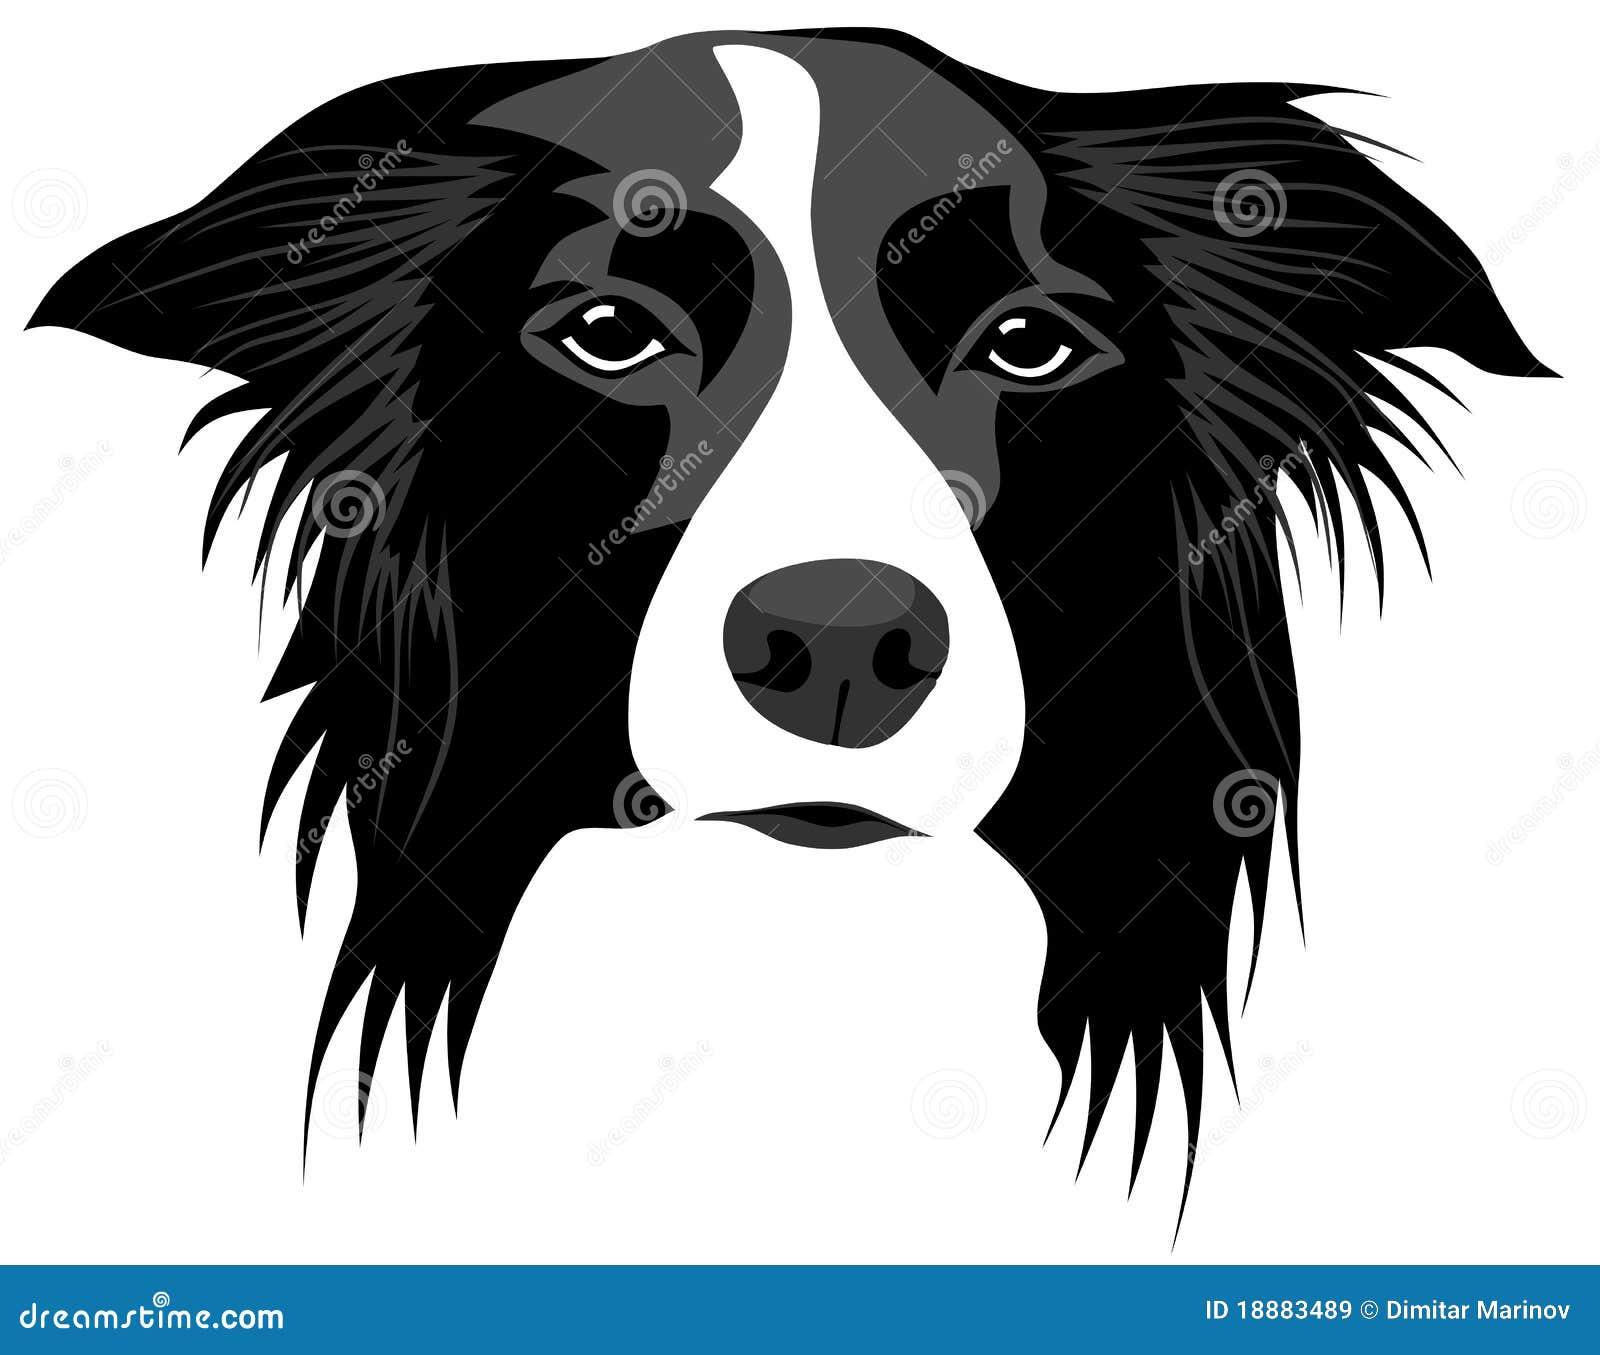 border collie stock illustrations 405 border collie stock rh dreamstime com cartoon border collie clipart Dog Clip Art